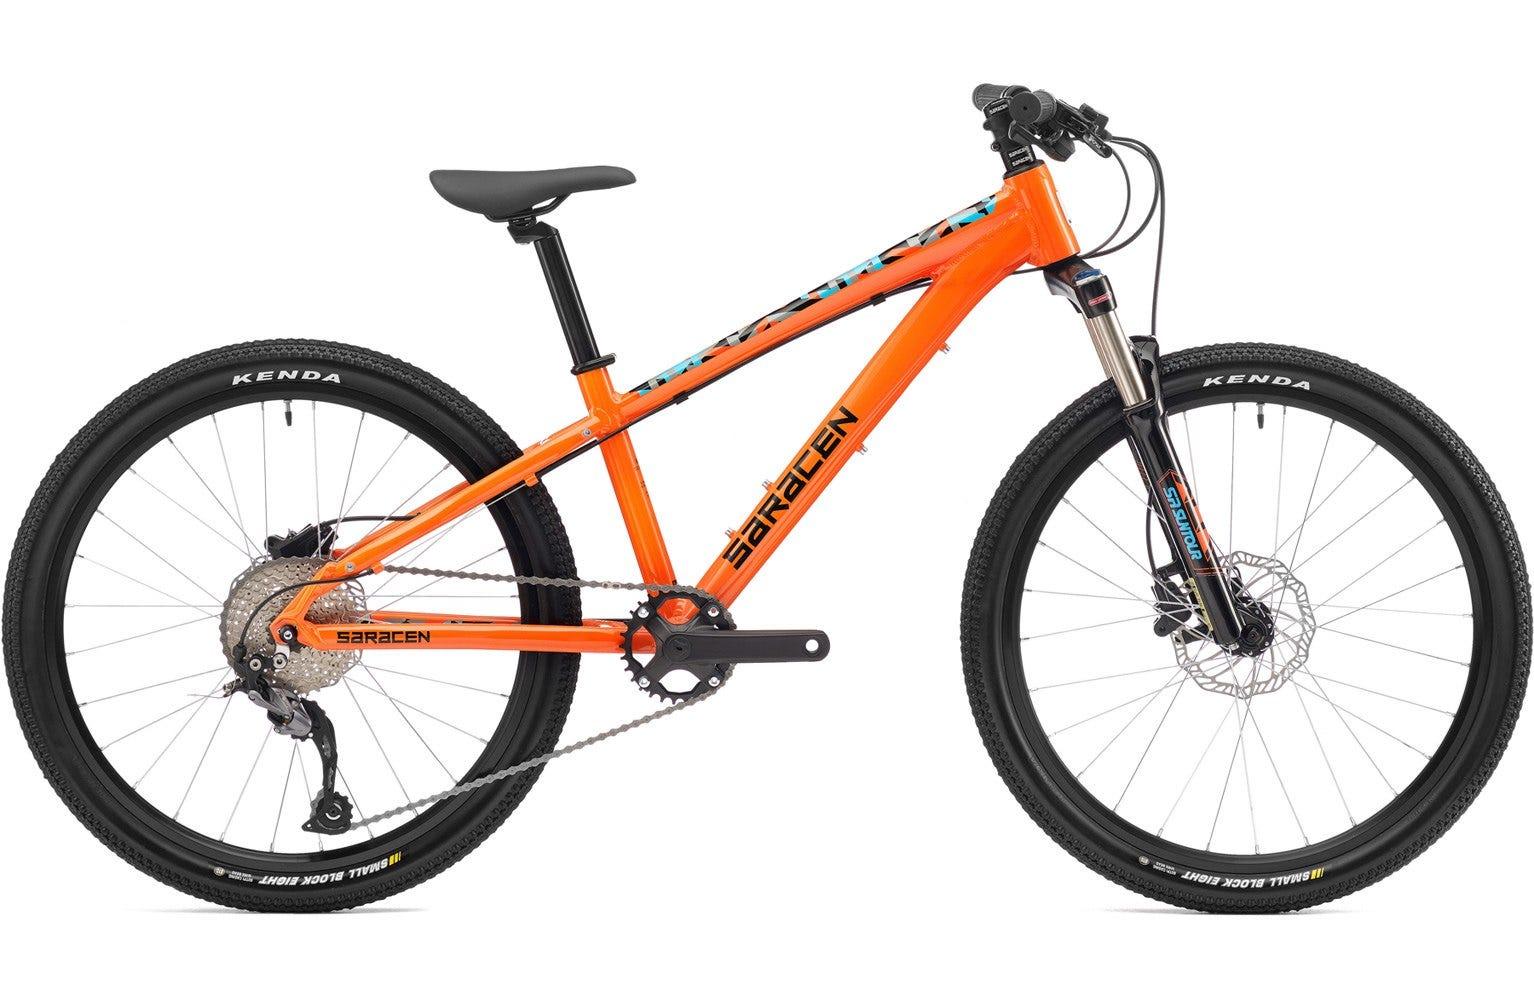 Saracen Mantra 2.4 bike